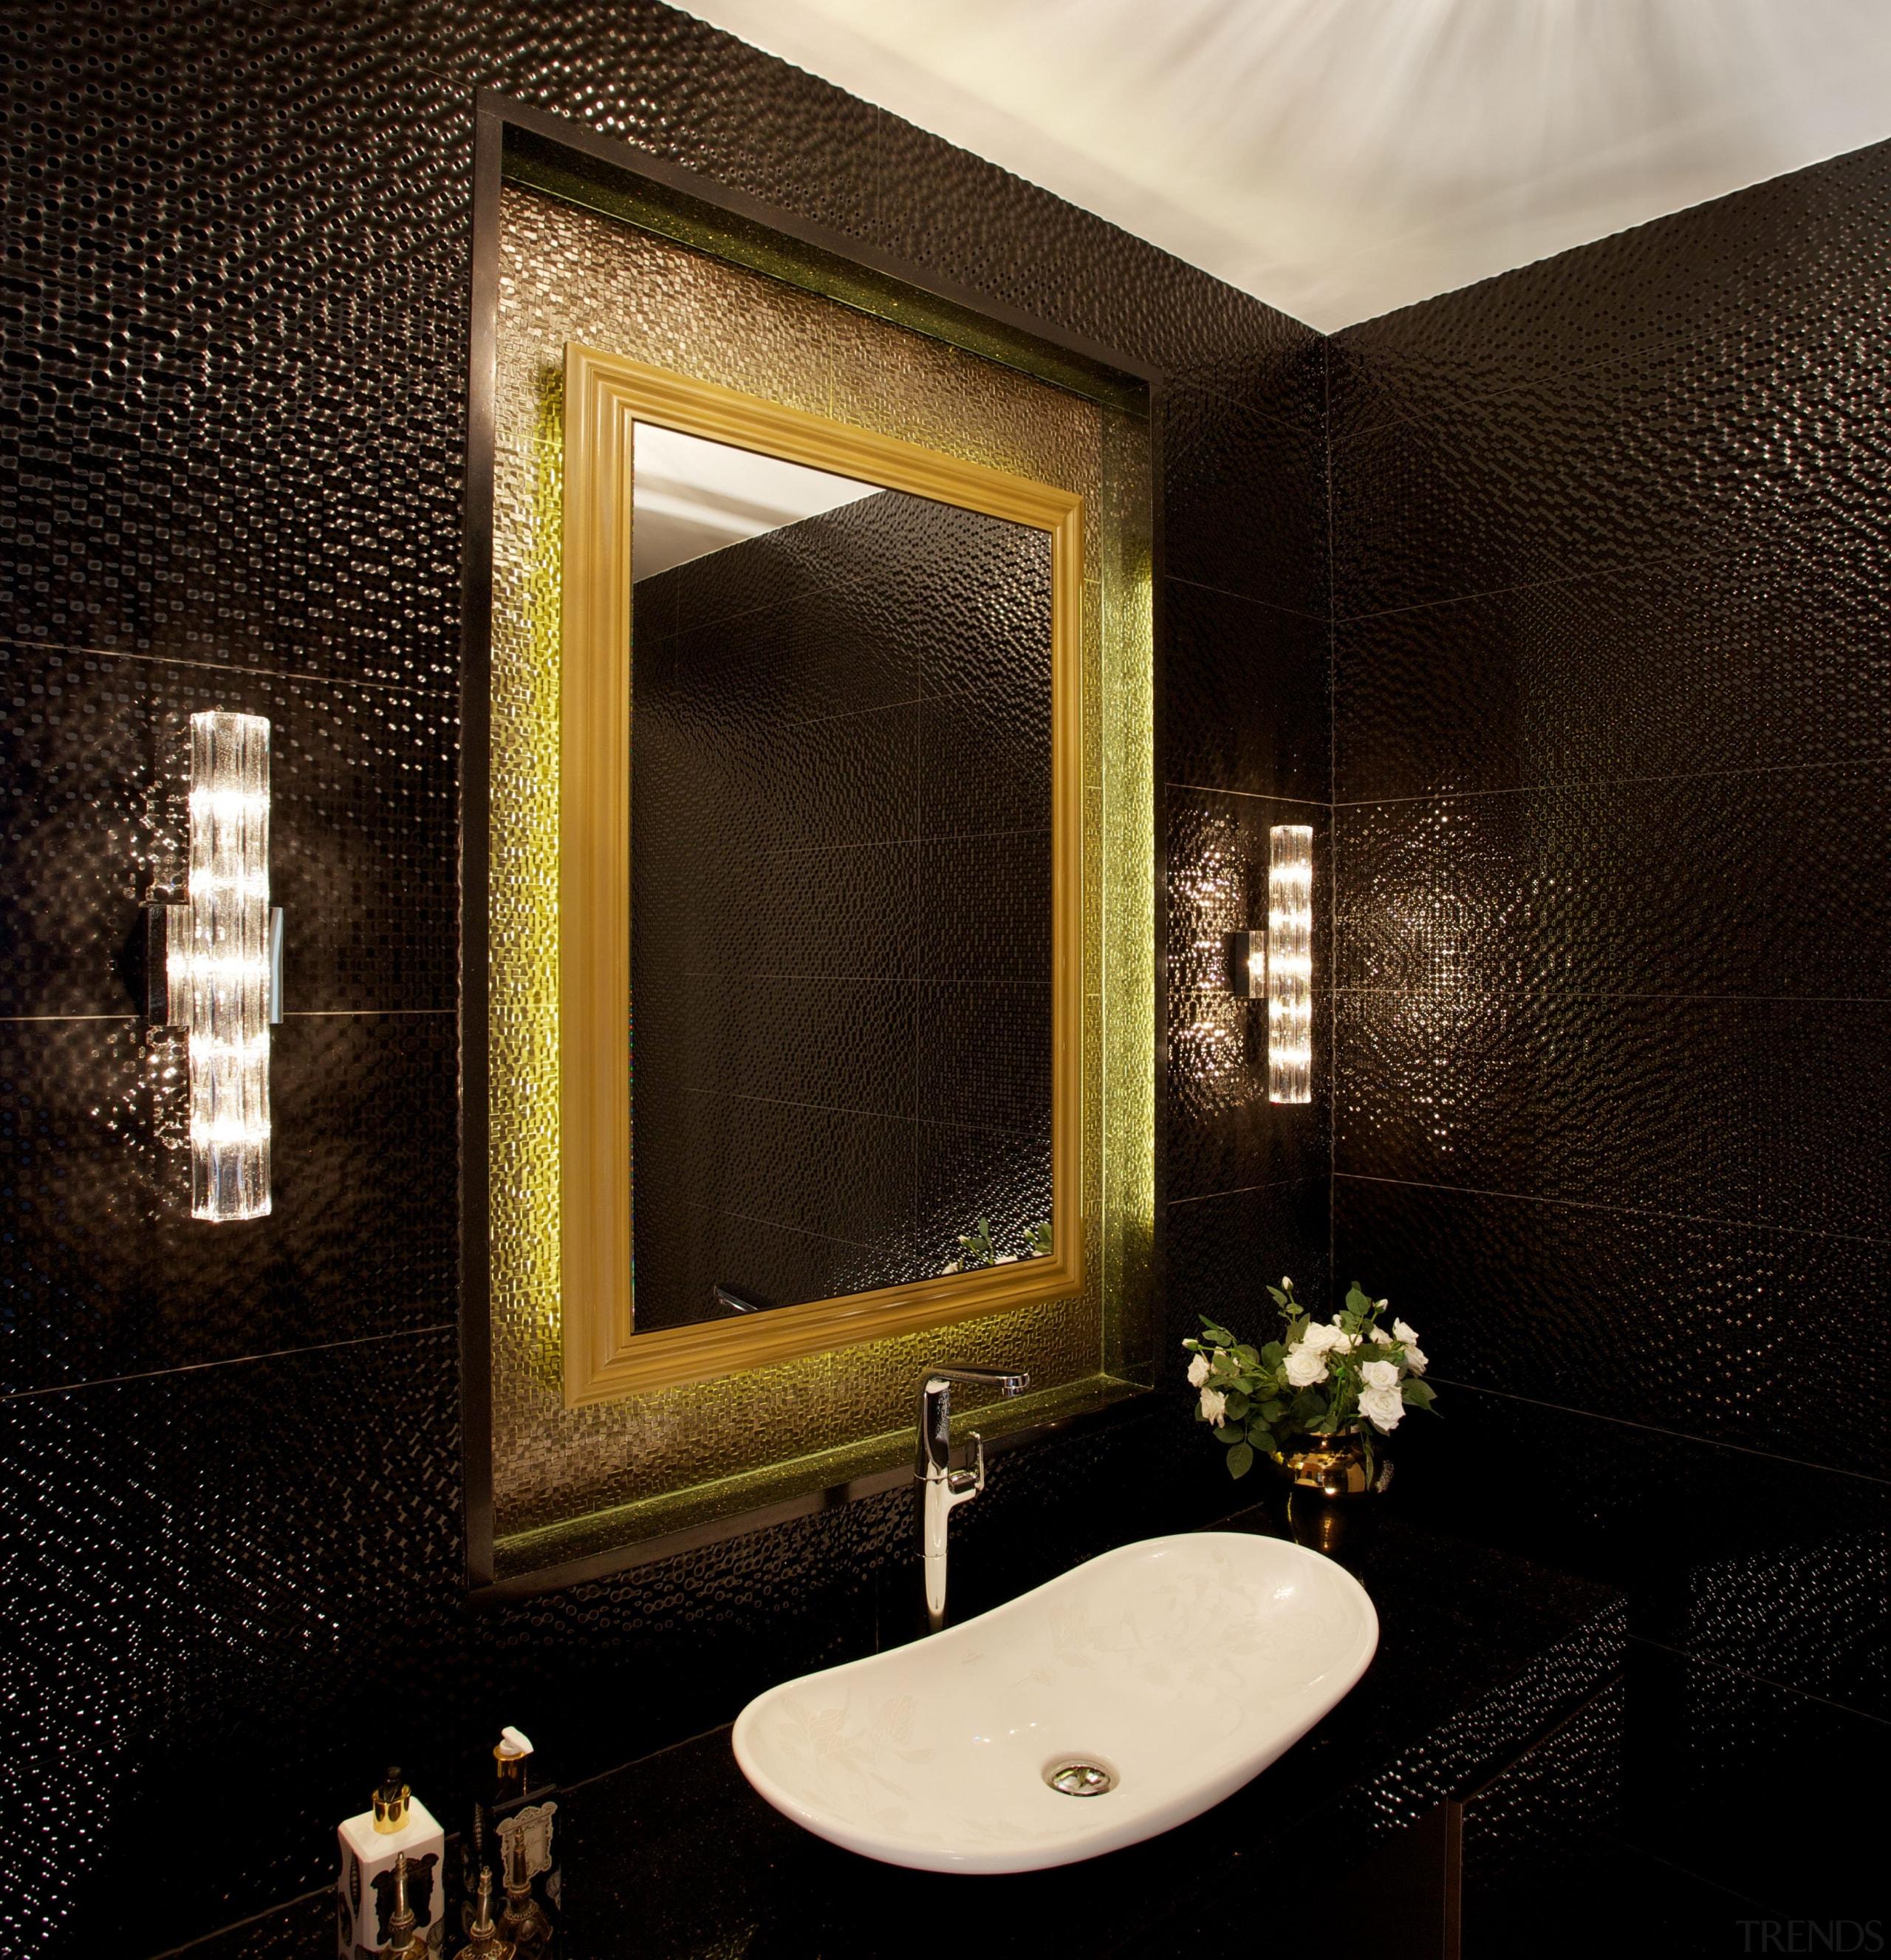 6 Ways to Turn Your Bathroom Into a architecture, bathroom, bathroom accessory, bathroom sink, ceiling, interior design, lighting, mirror, plumbing fixture, property, restroom, room, sink, tile, toilet, wall, wallpaper, black